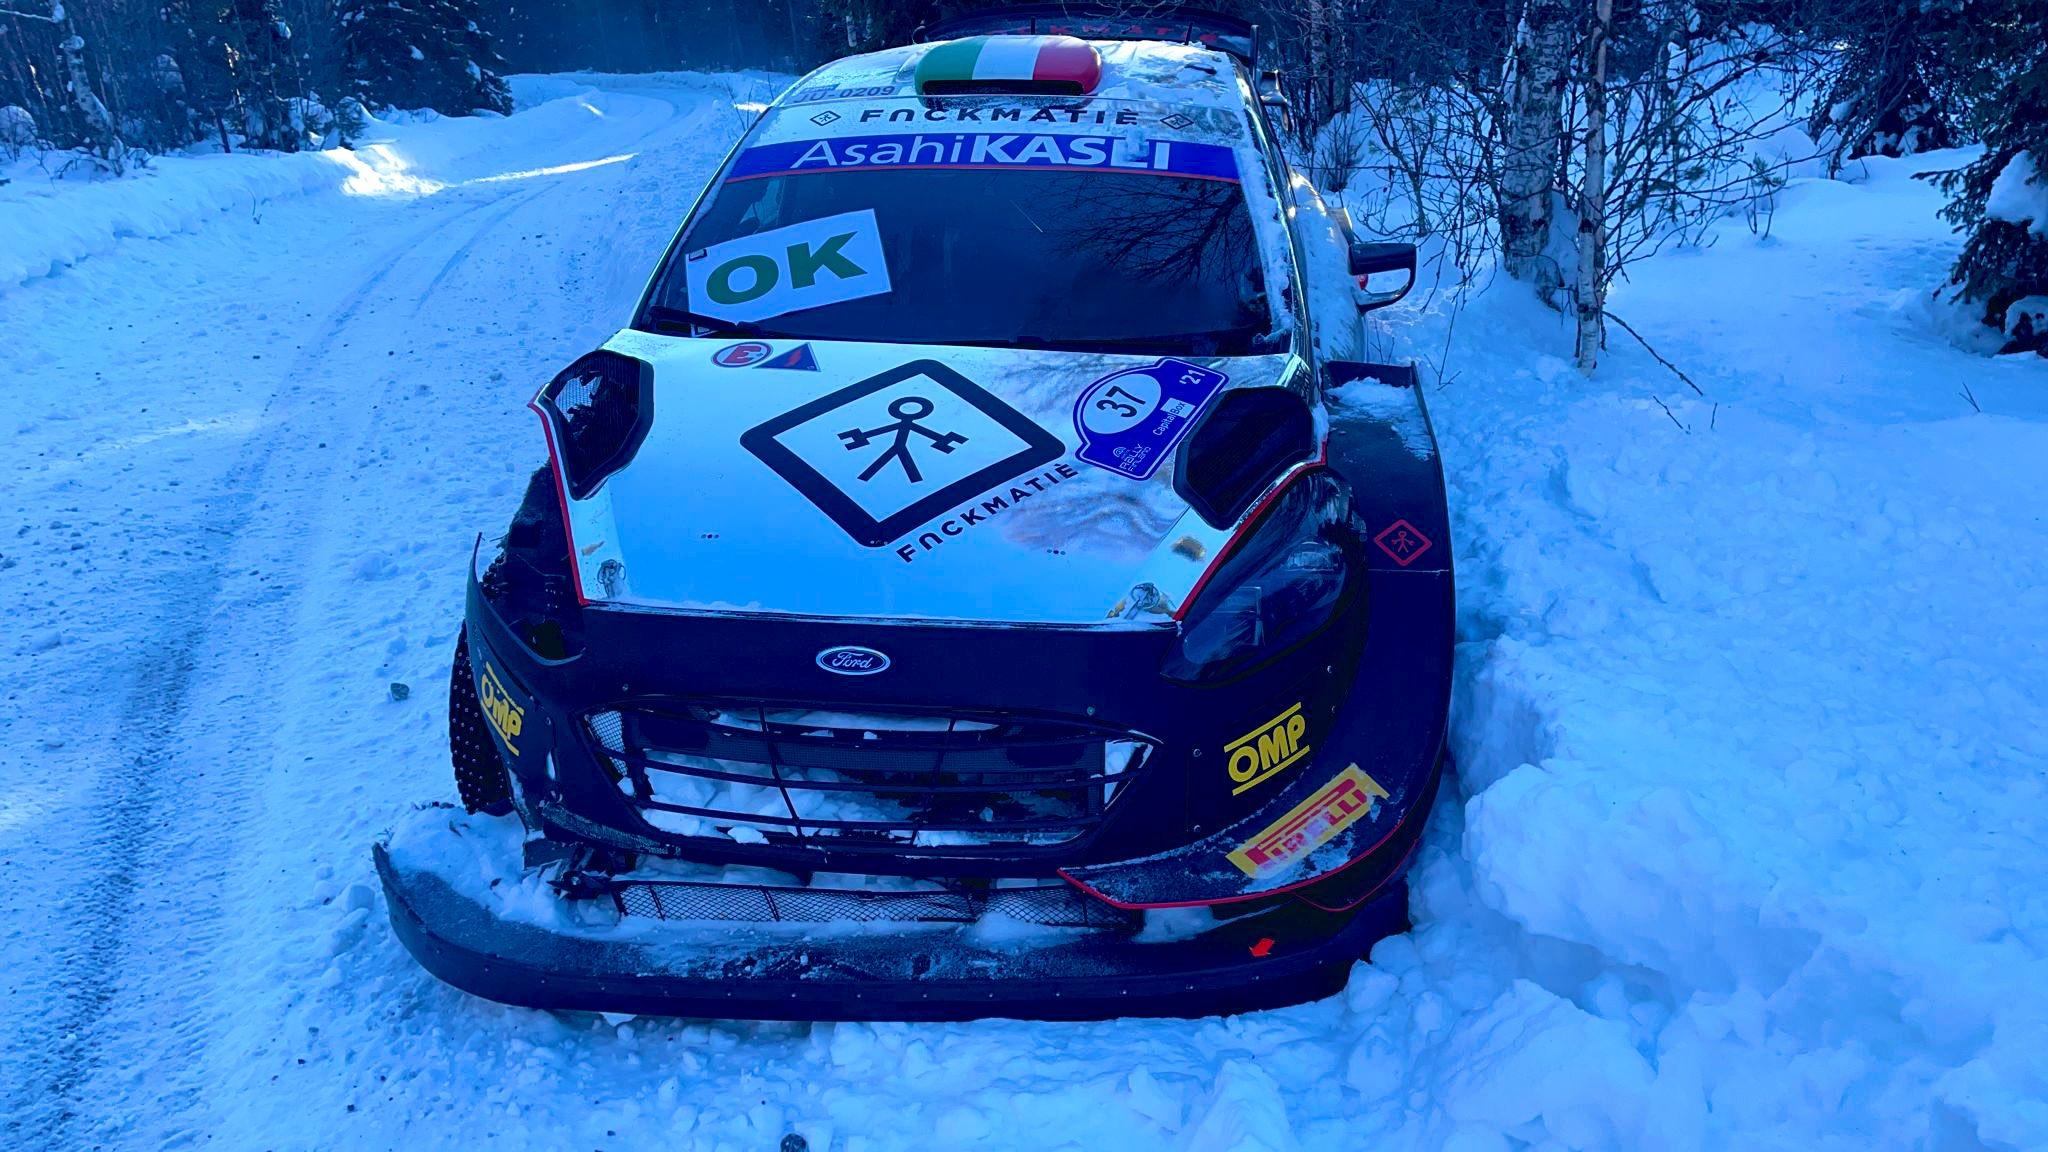 WRC: Arctic Rally Finland - Powered by CapitalBox [26-28 Febrero] - Página 5 EvOyJSsXAAIAq4P?format=jpg&name=large